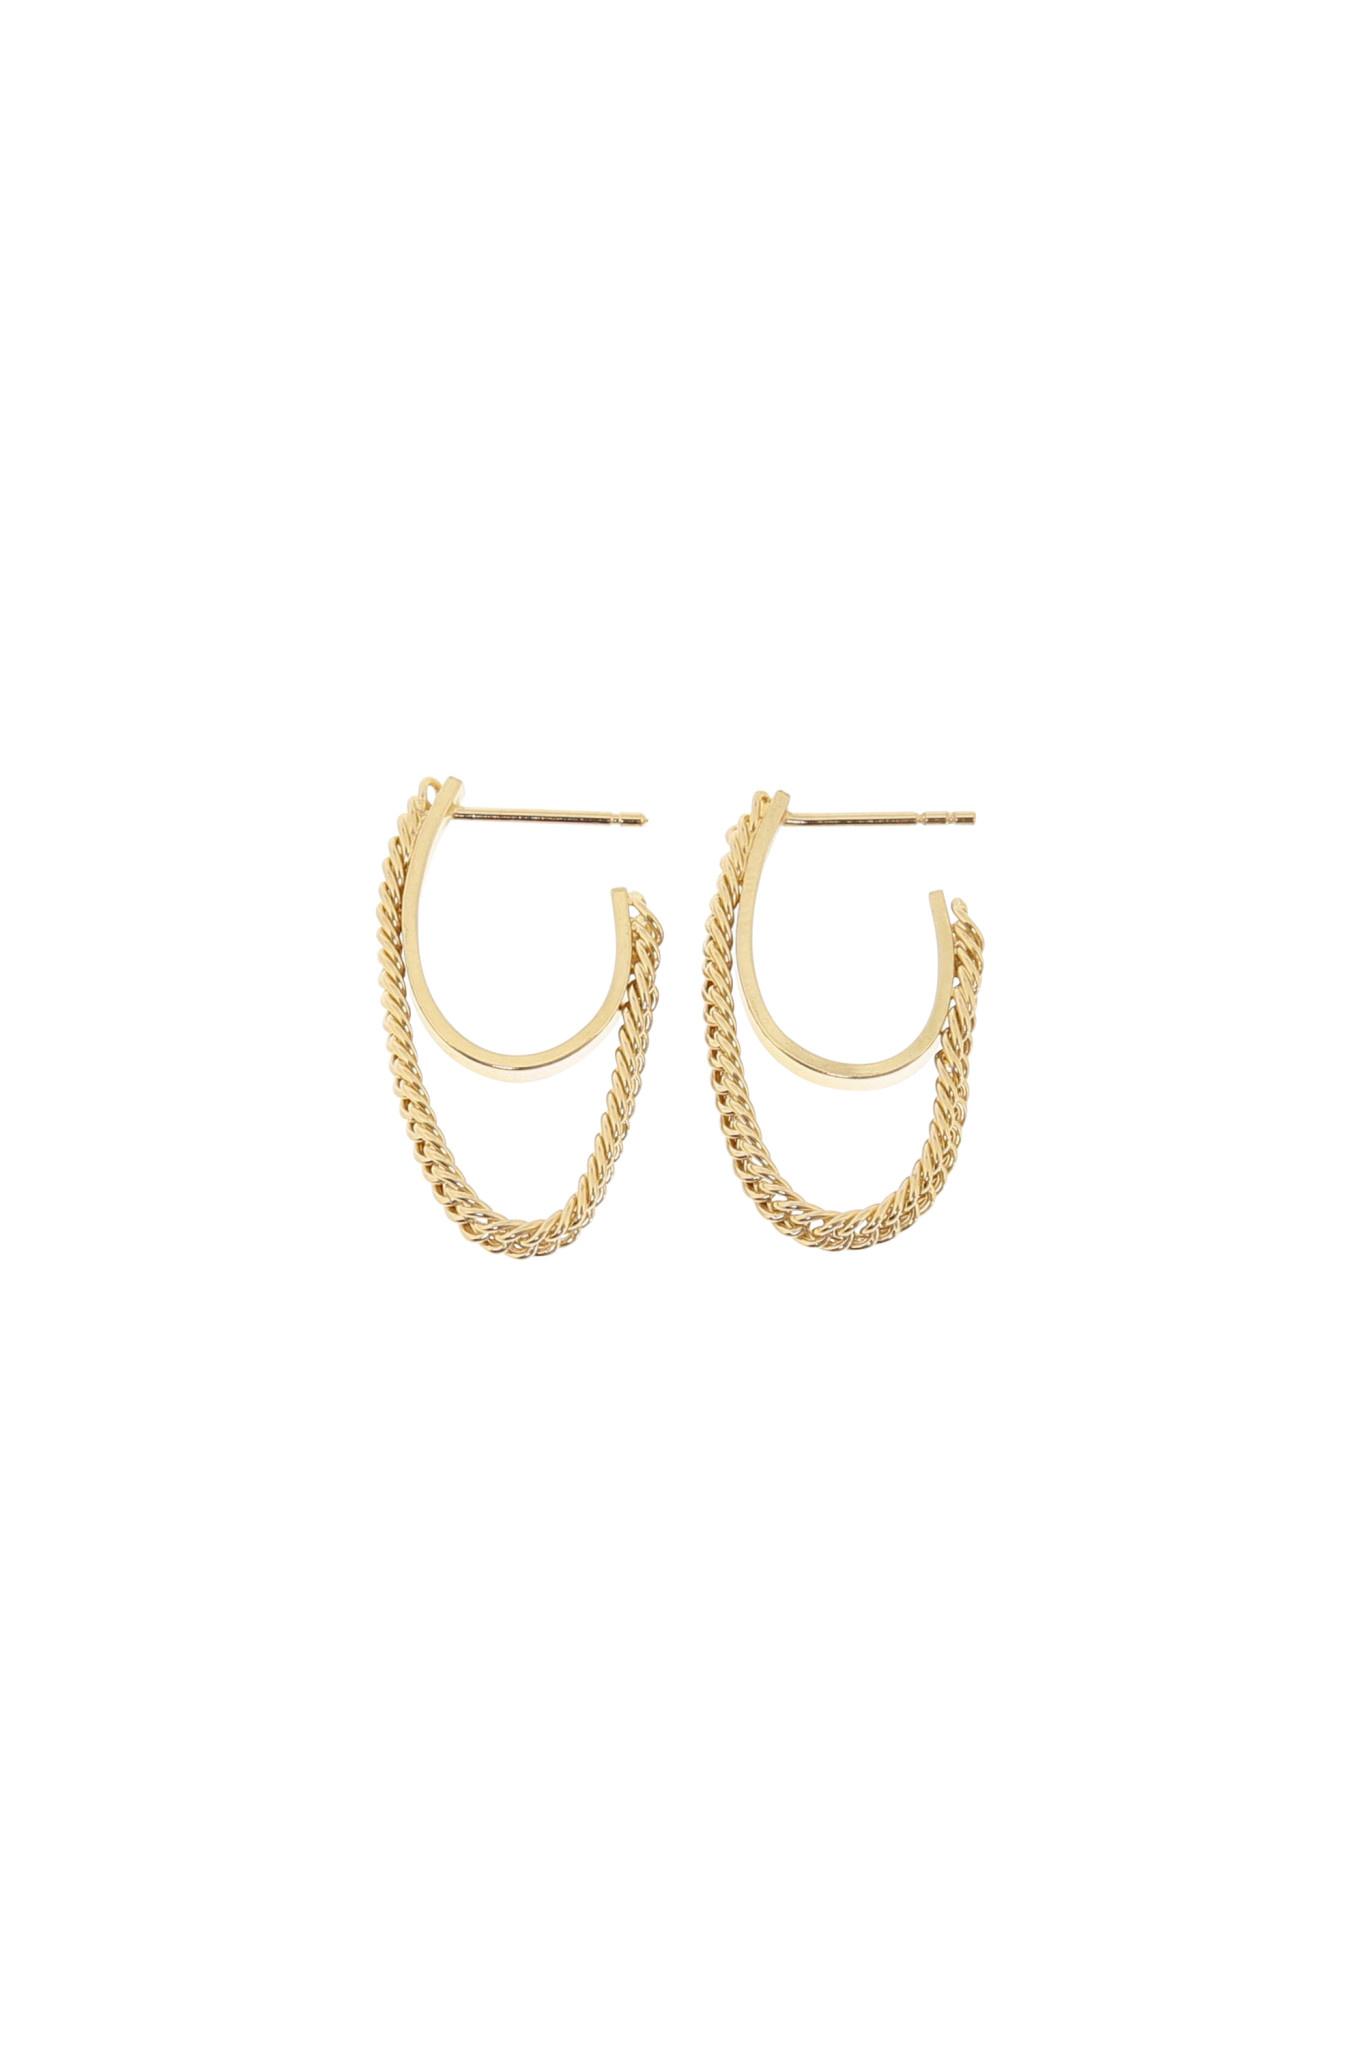 Studio Collect - Semi Flexible Hoop Earrings